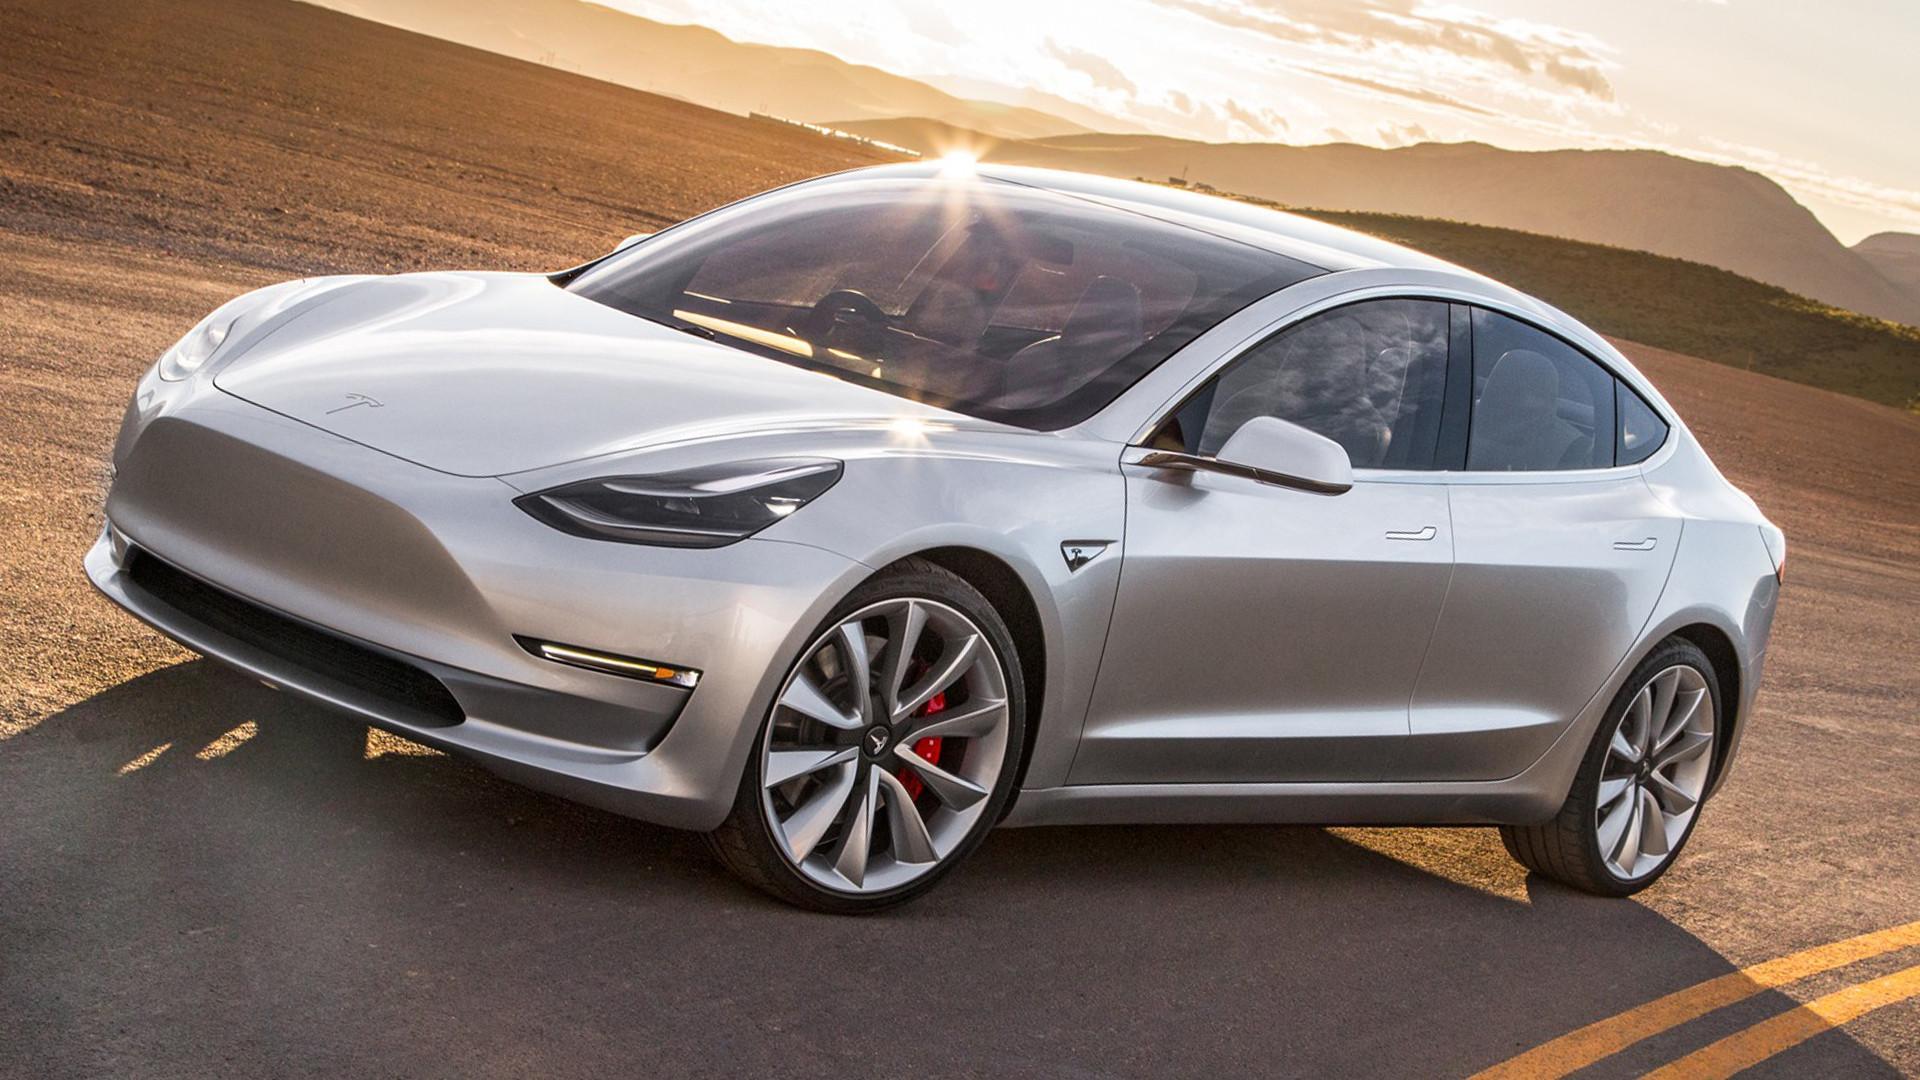 Tesla Model 3 Wallpapers - Top Free Tesla Model 3 ...